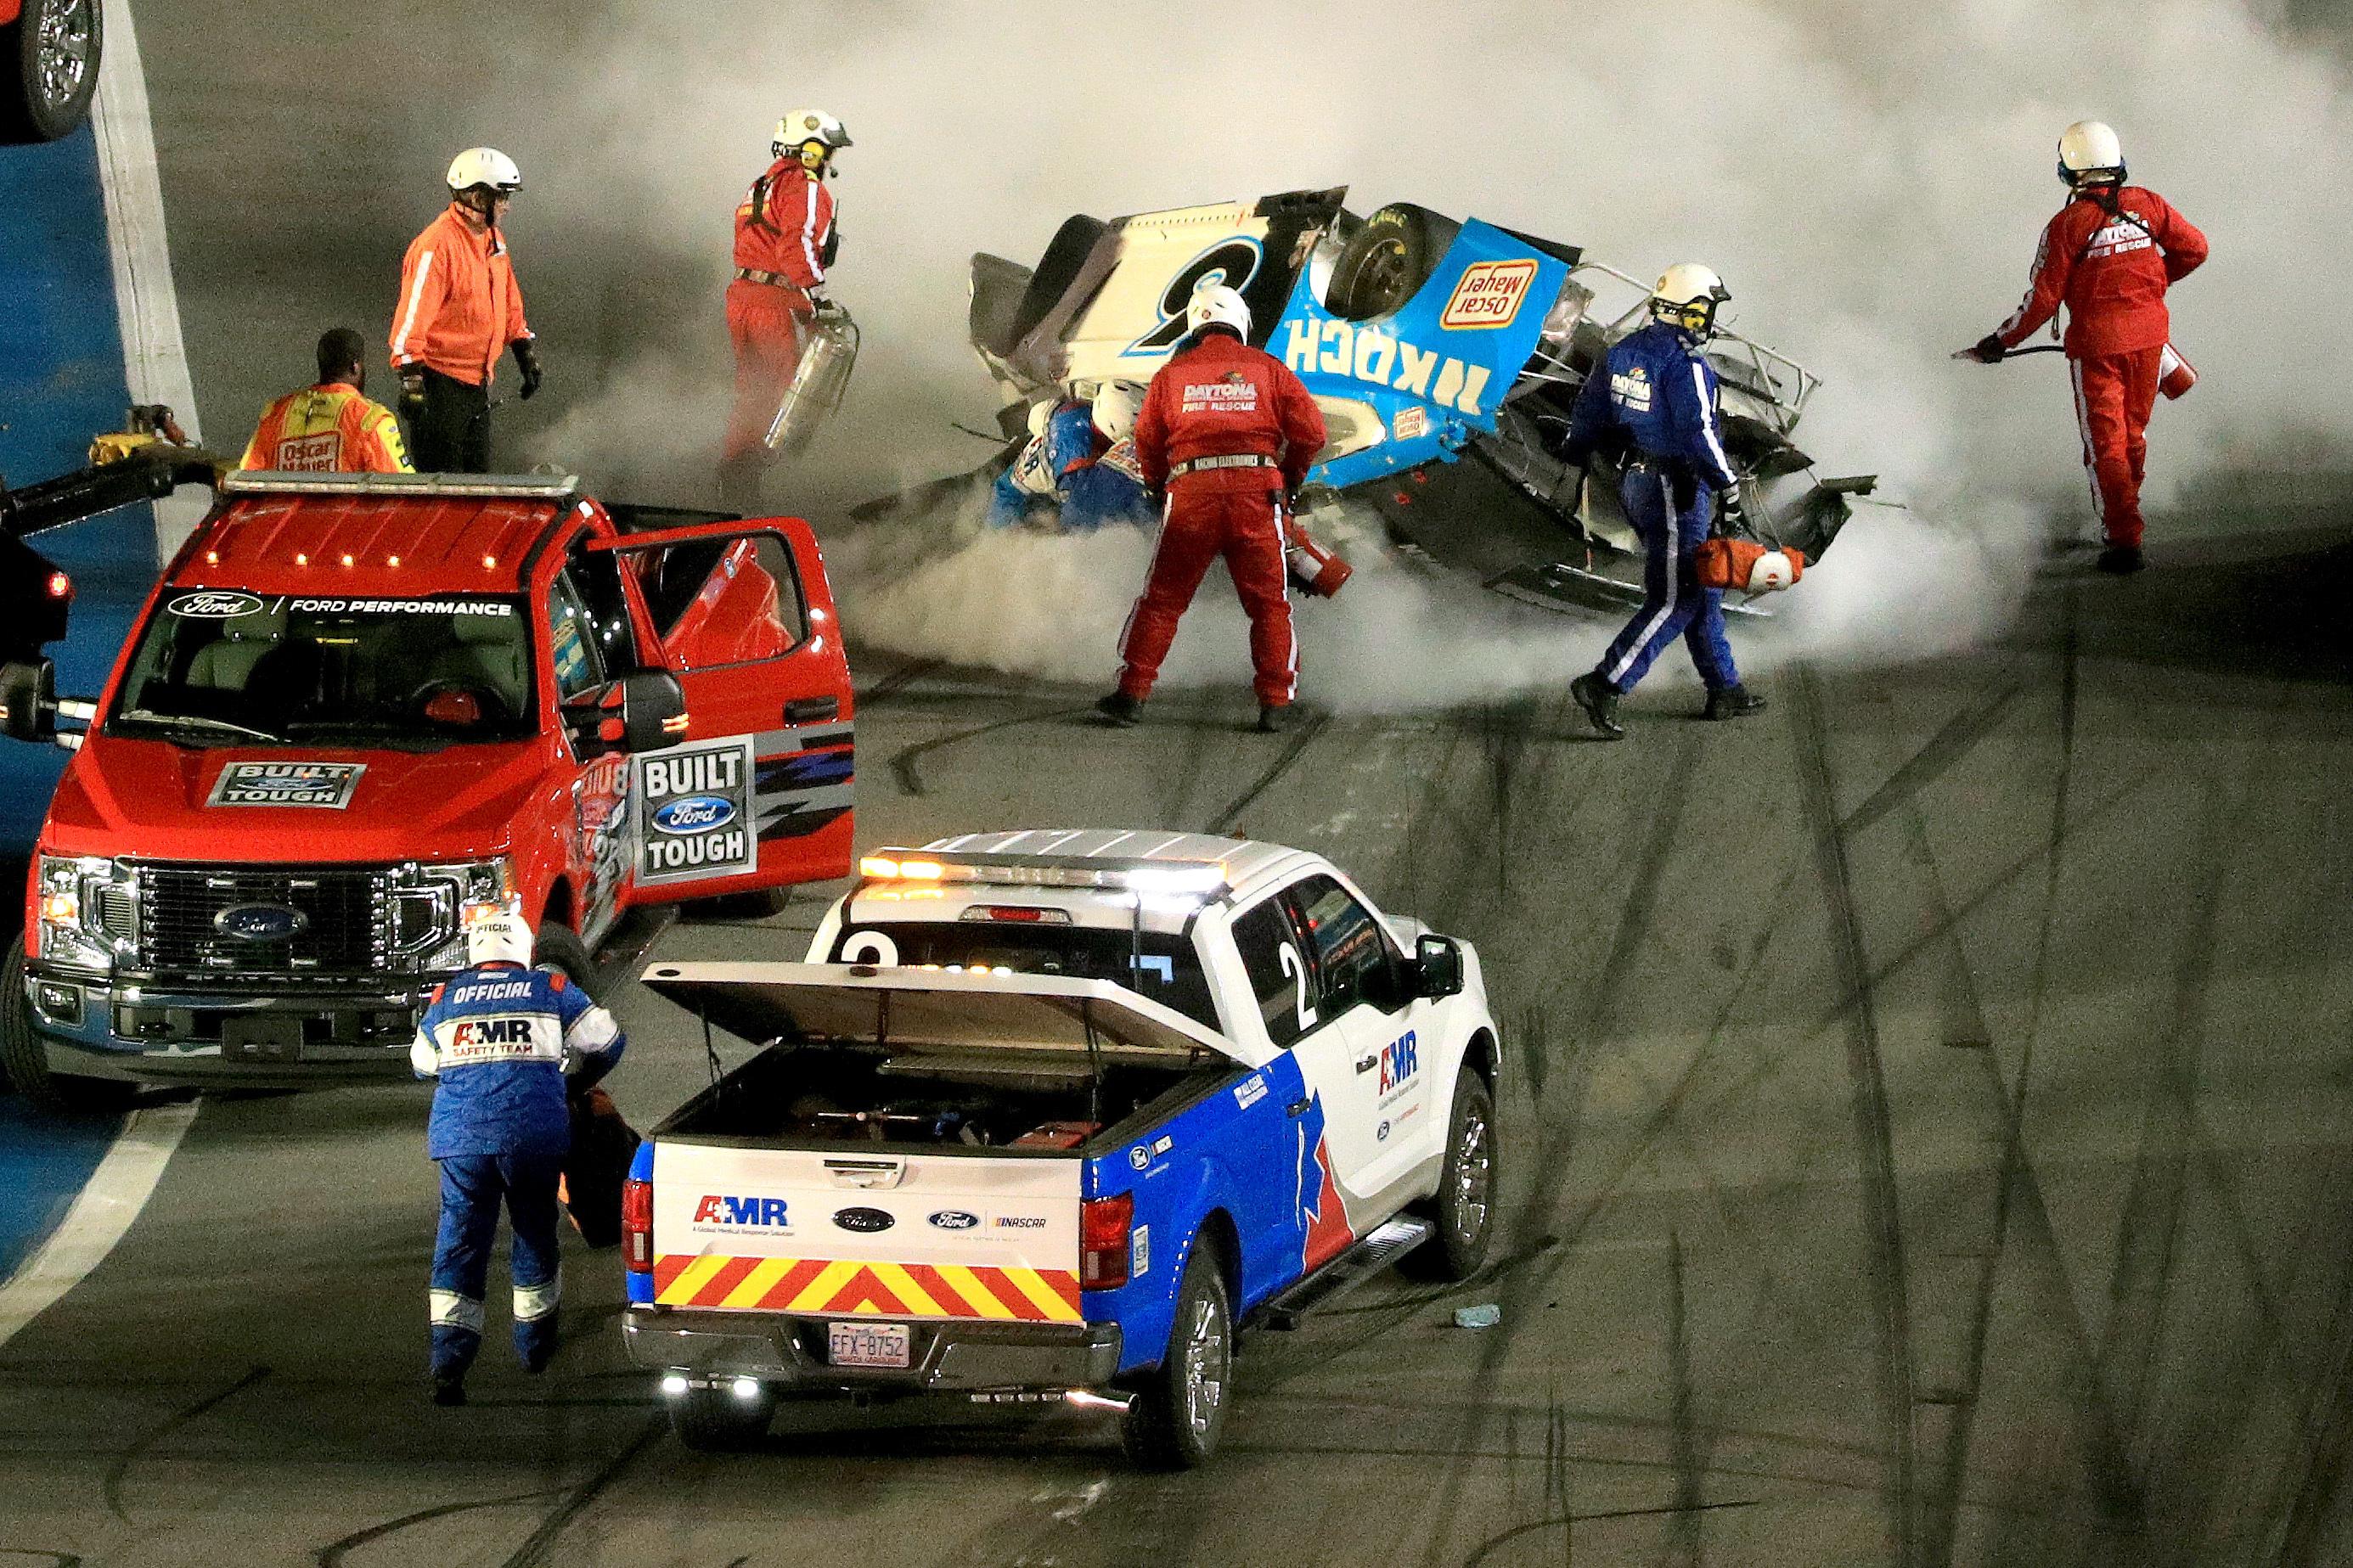 Nascar Paramedic Got Into Ryan Newman S Car 35 Seconds After Daytona 500 Crash Bleacher Report Latest News Videos And Highlights